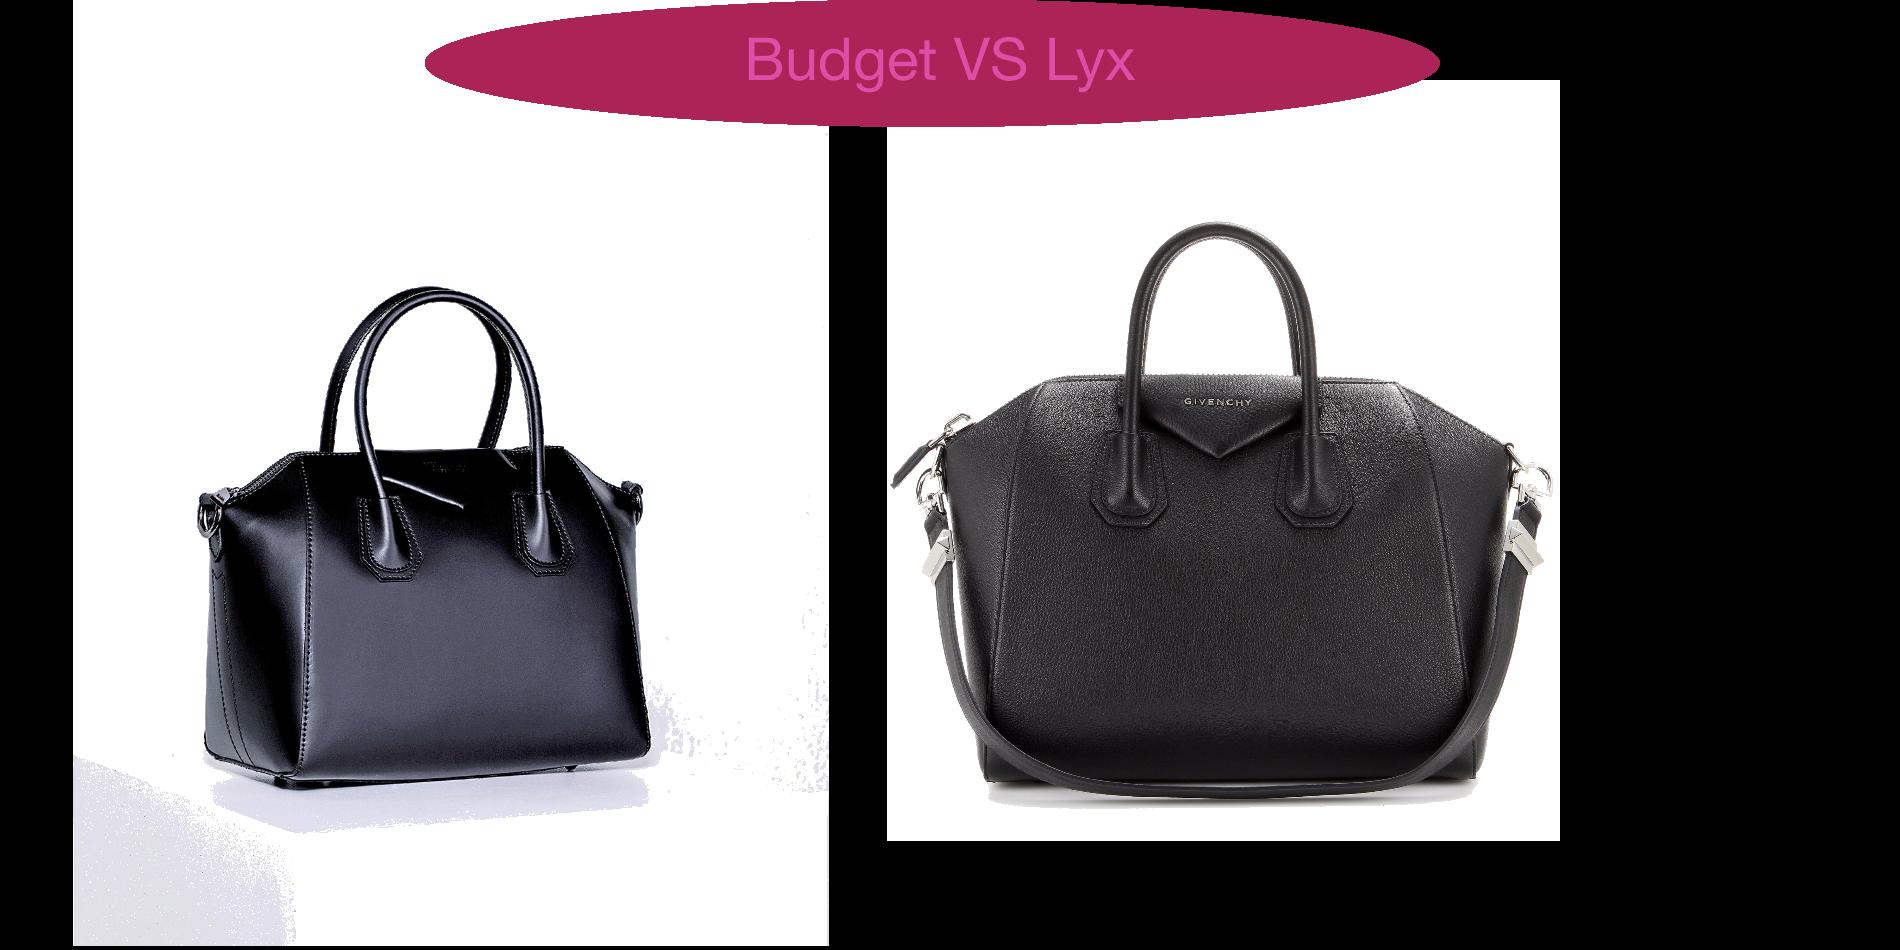 Budget Vs Lyx